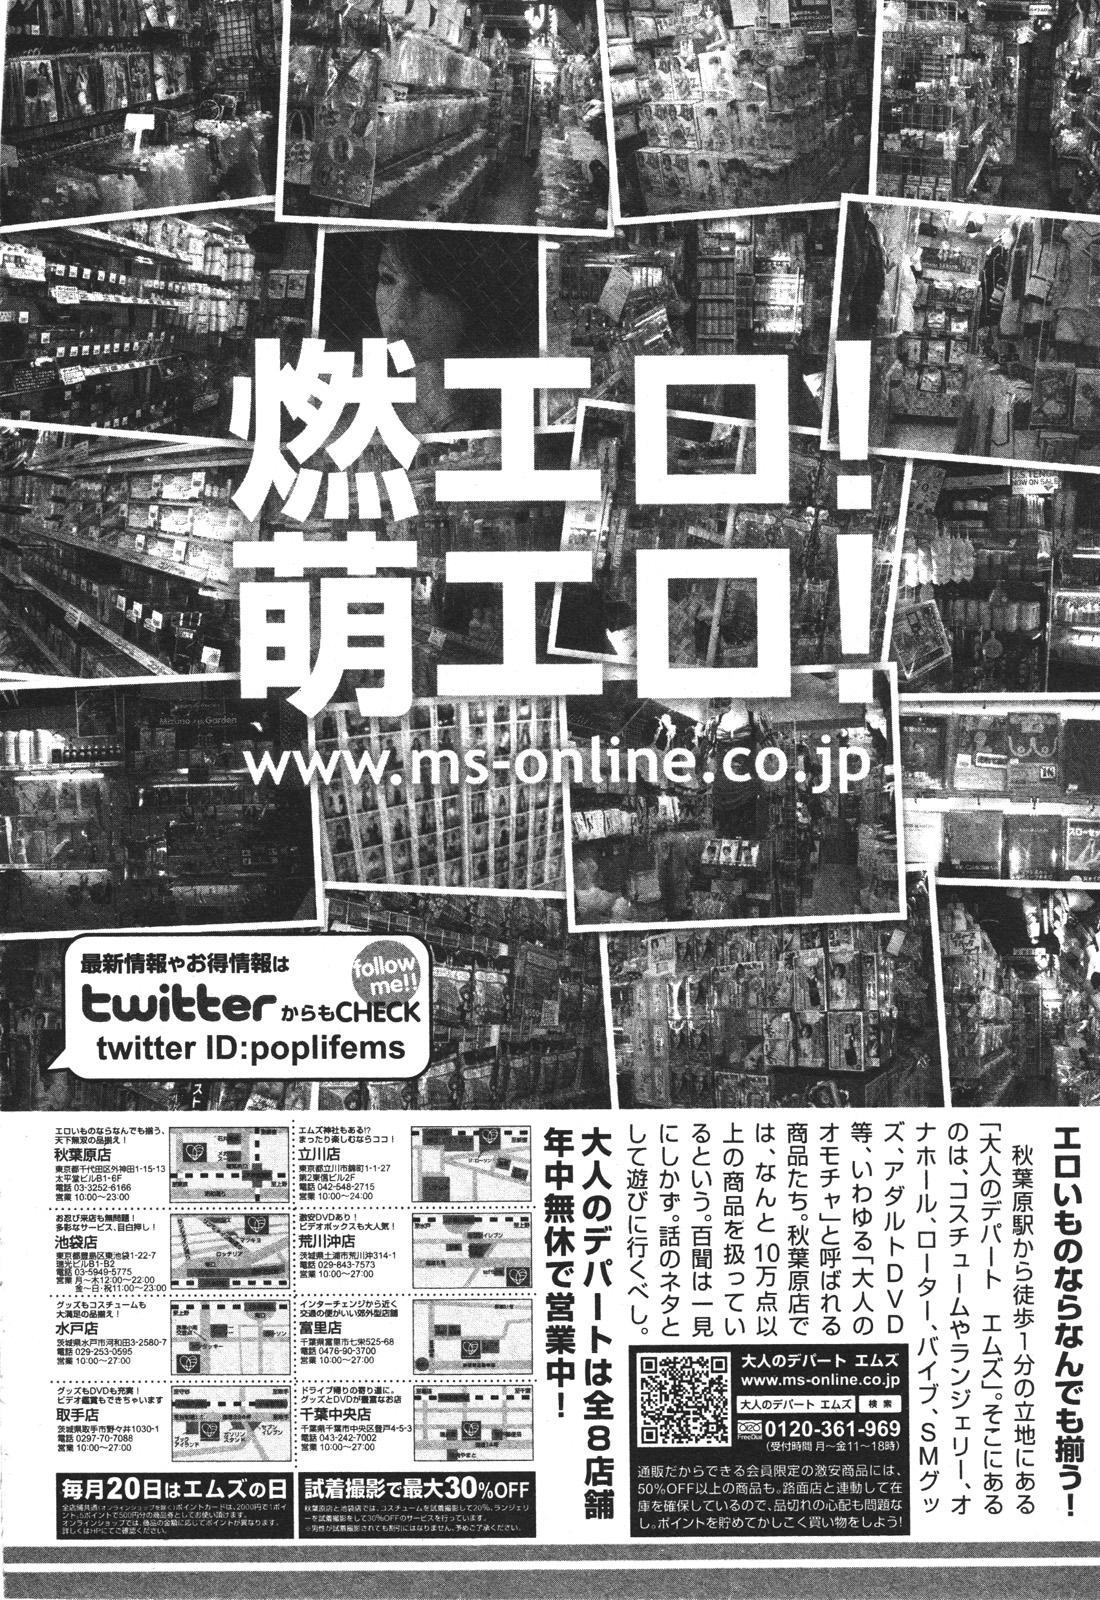 BUSTER COMIC 2010-05 Vol.07 410